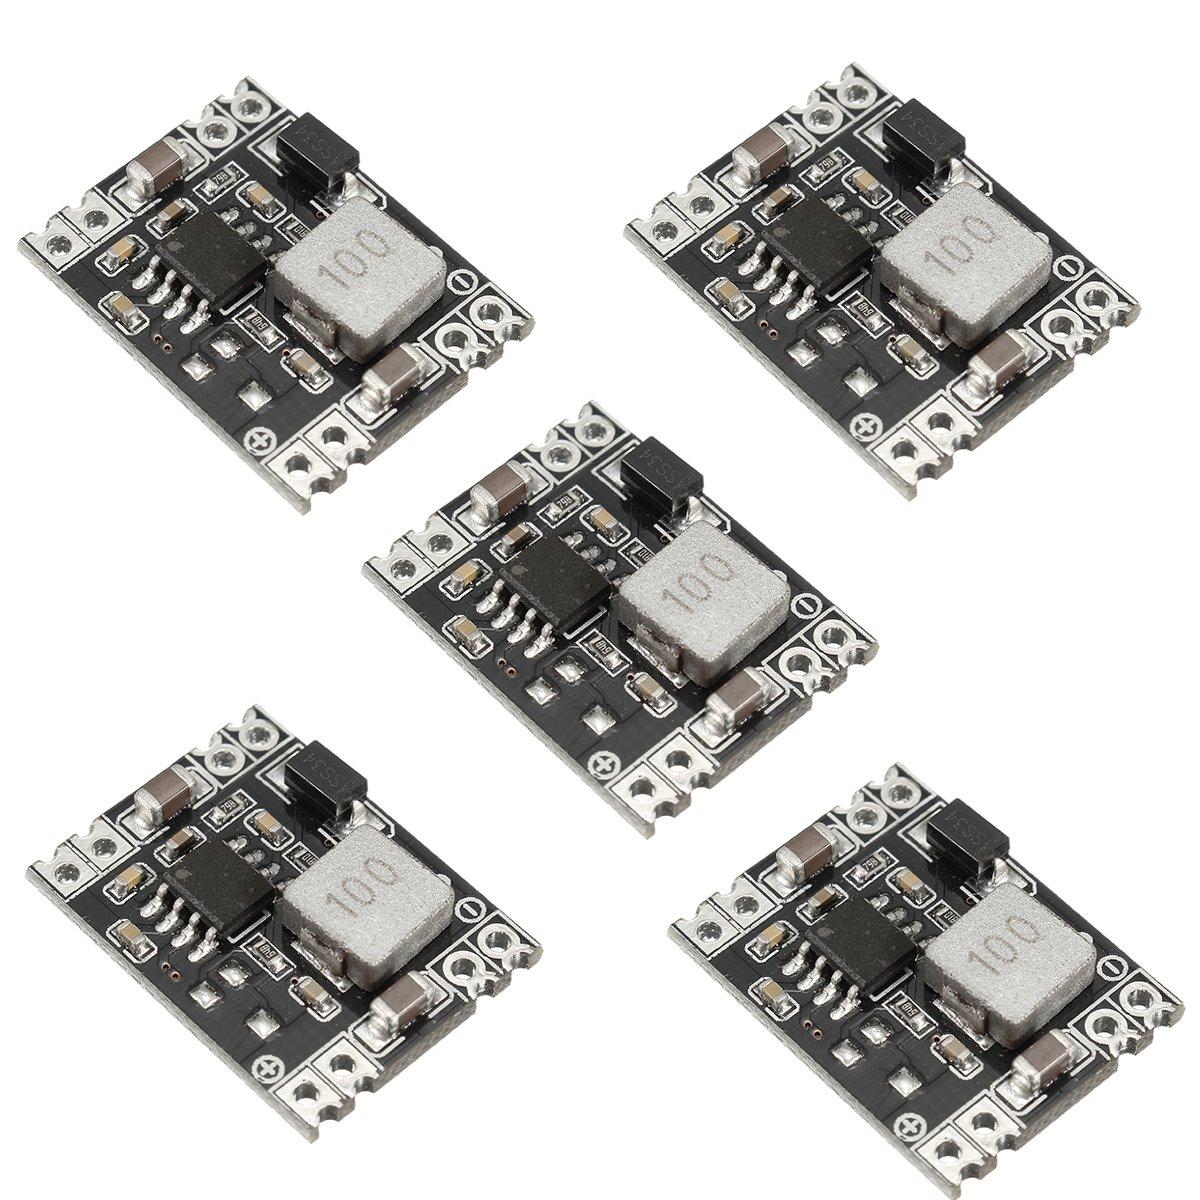 Dual Usb Circuit Board Output 9v 12v 24v 36v To 5v Dc 3a Step Diagram Power Supply Circuits Fixed 5pcs Module Kit Buck Down Regulator